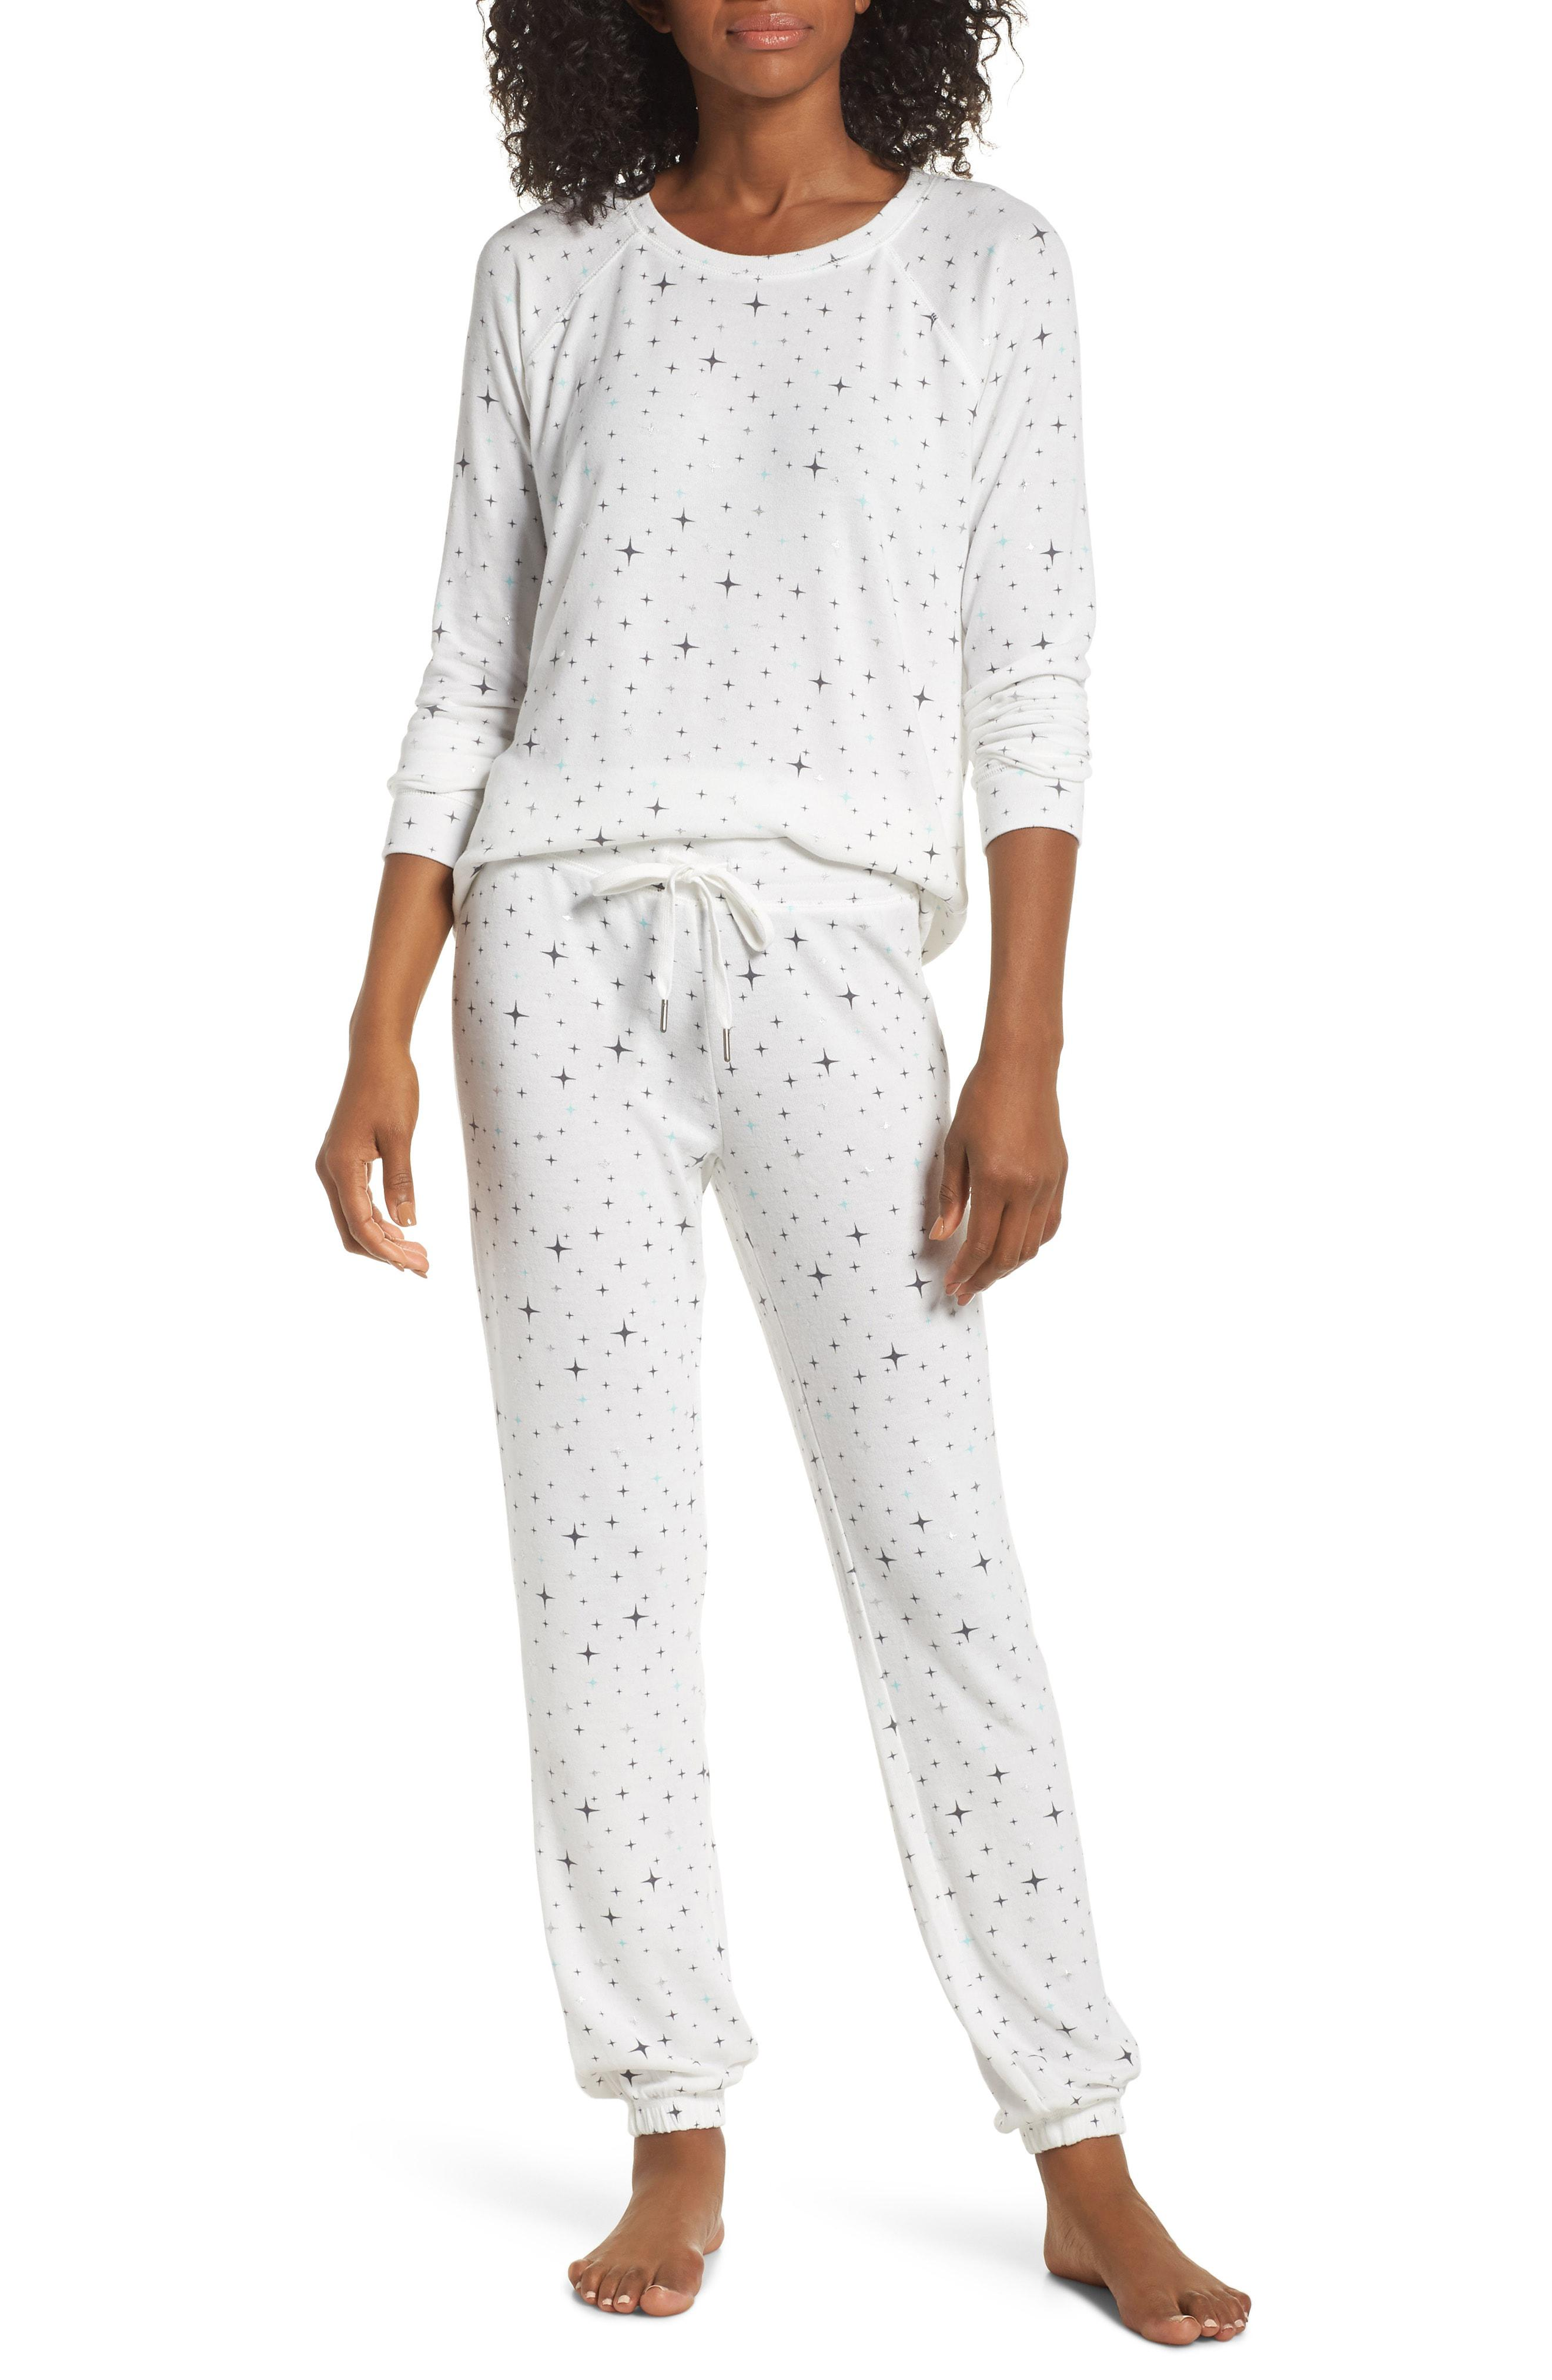 PJ Salvage Womens Pajama Top Size Medium Multicolor Racerback Striped Sleepwear